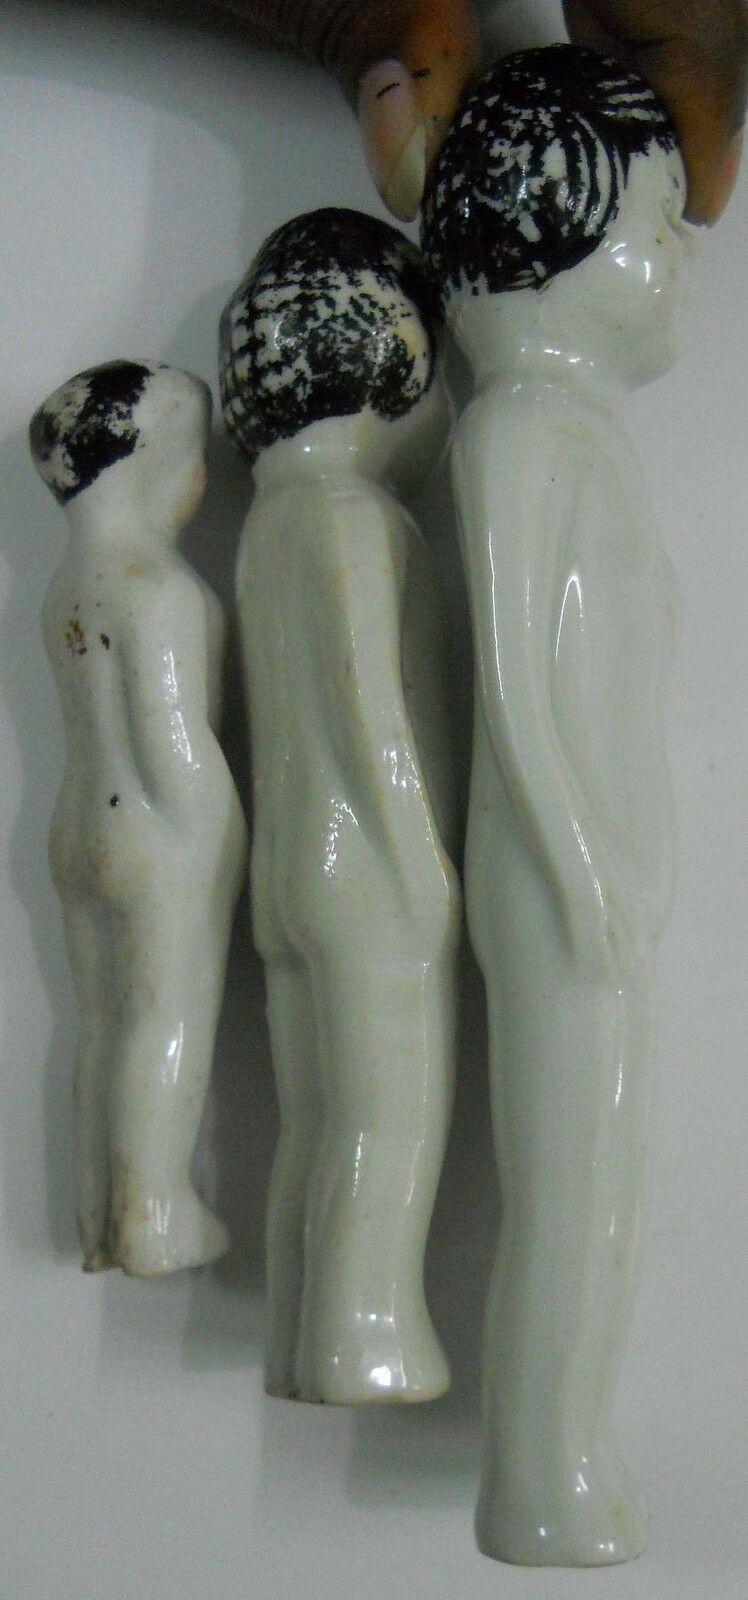 Vintage Porcelain Figurine 3 Girls over 40 years old #Po-7 image 9